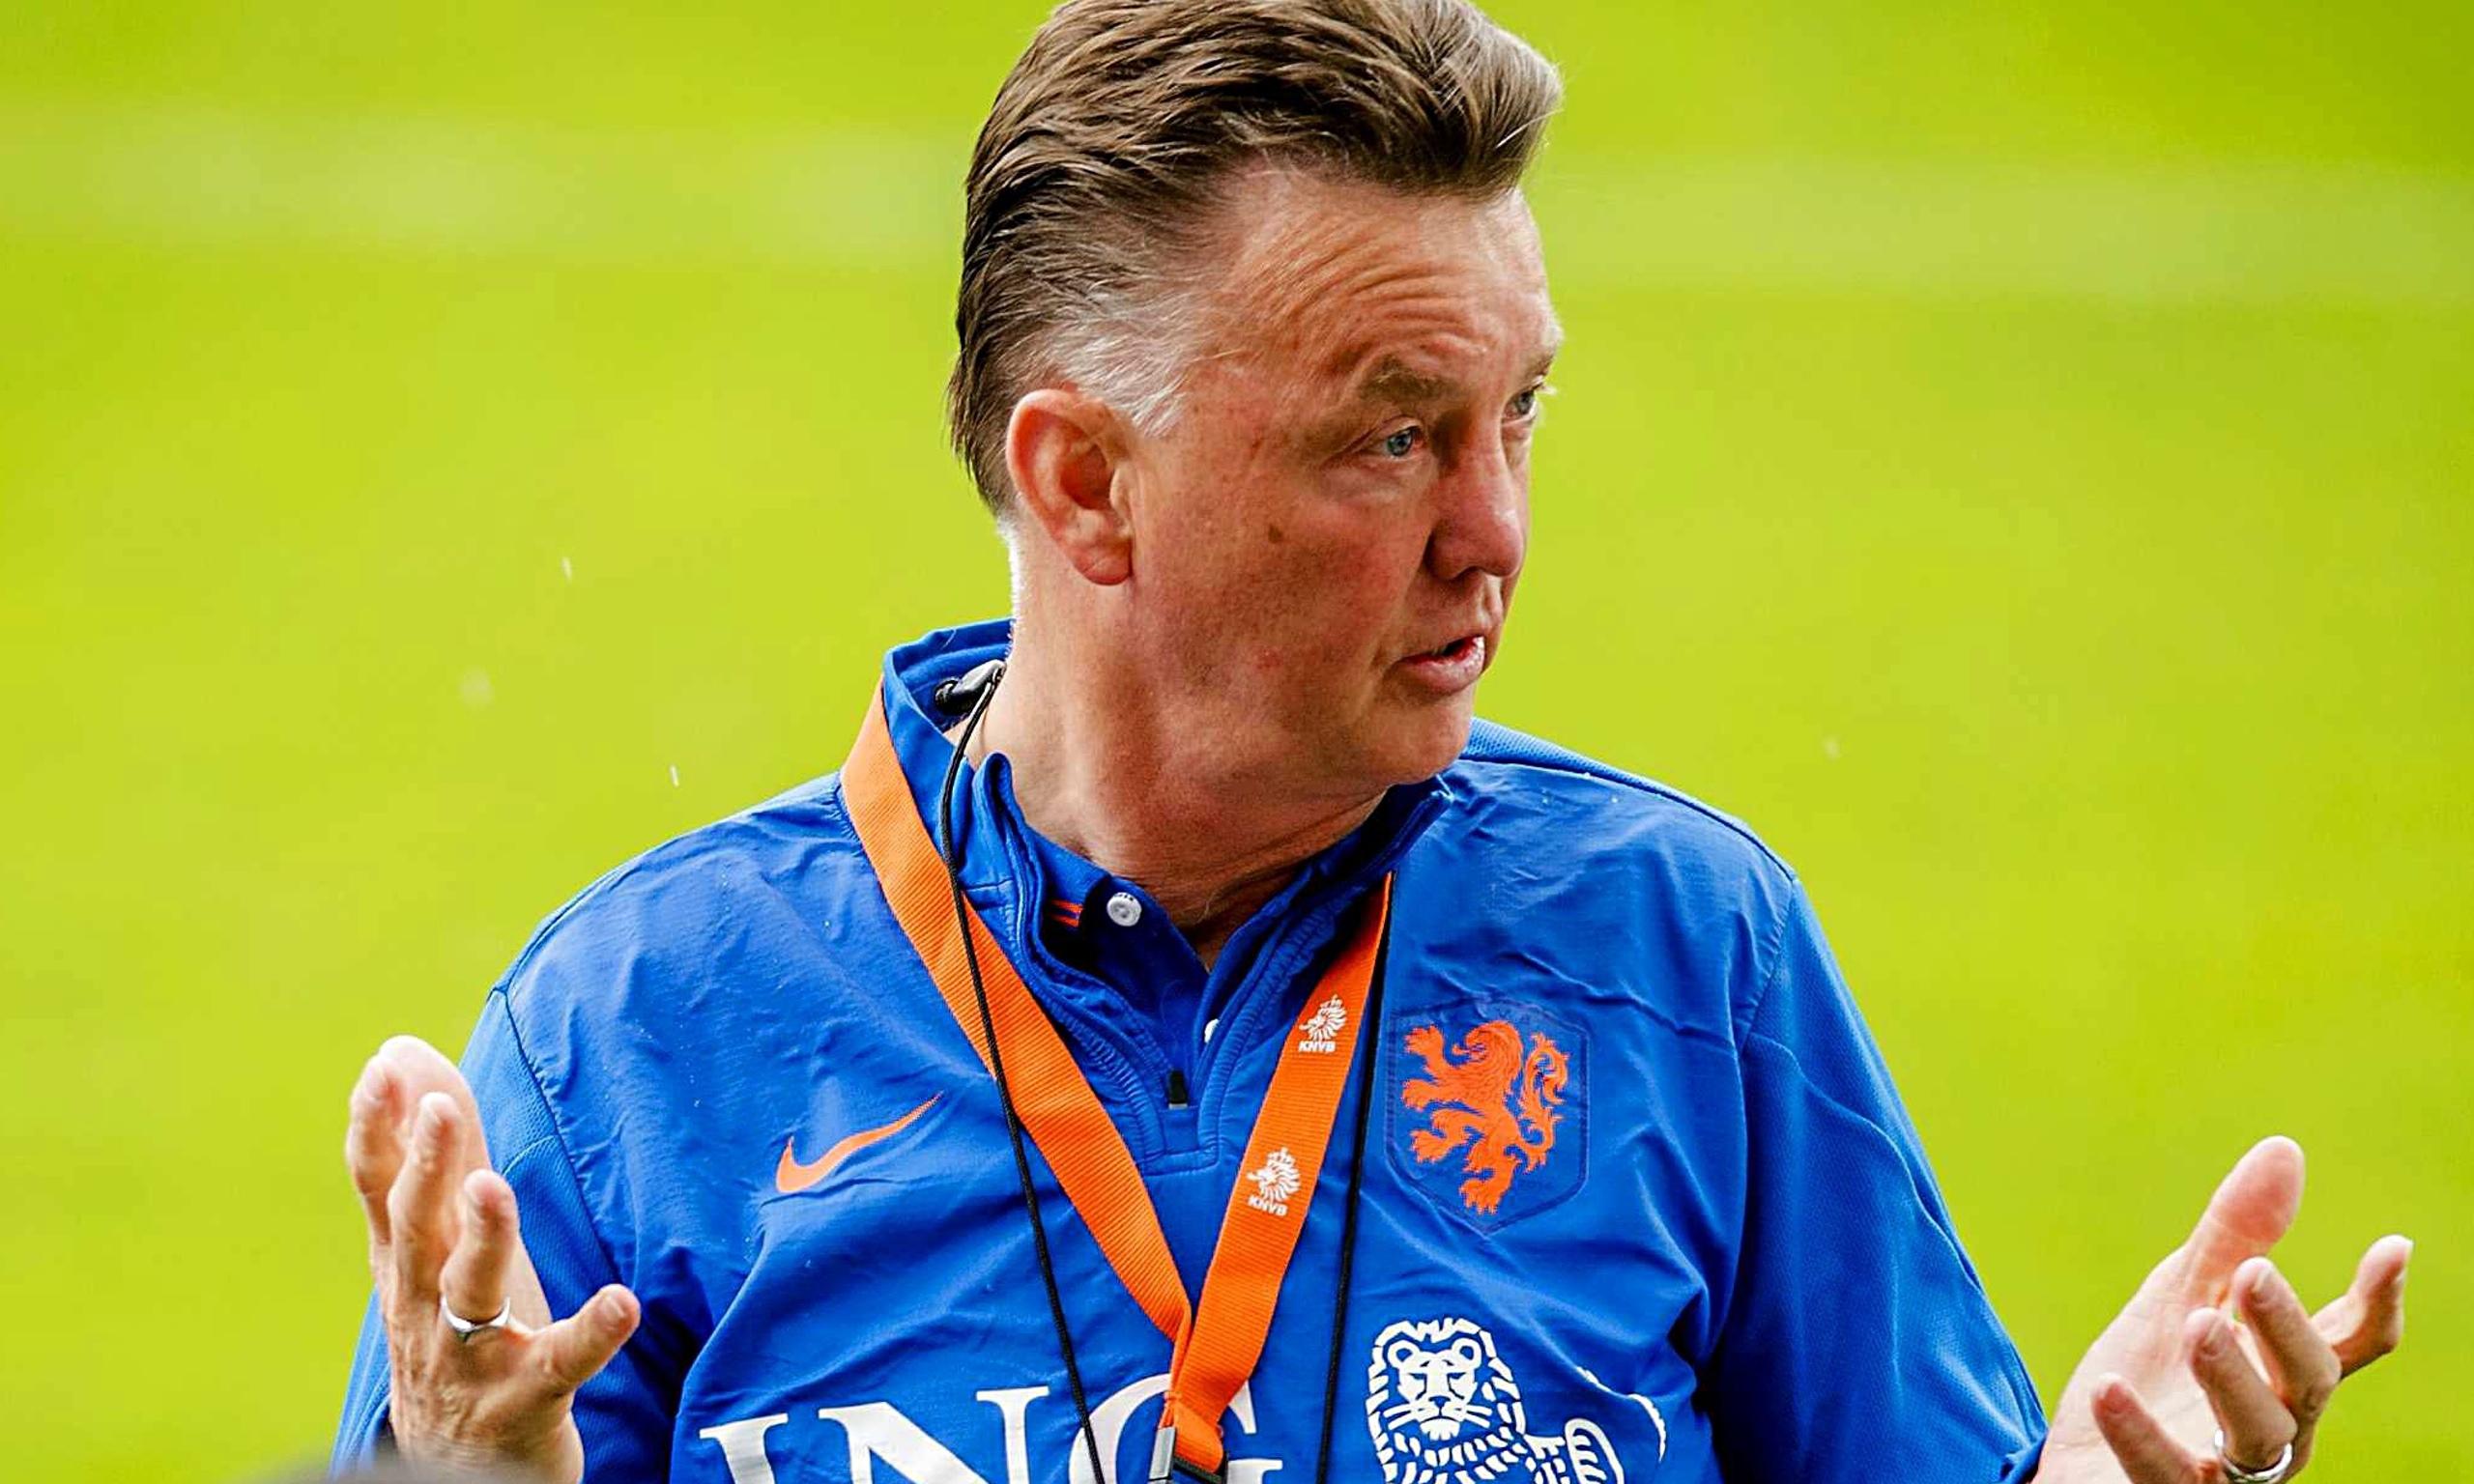 World Cup 2014: Louis Van Gaal To Keep Holland Happy By